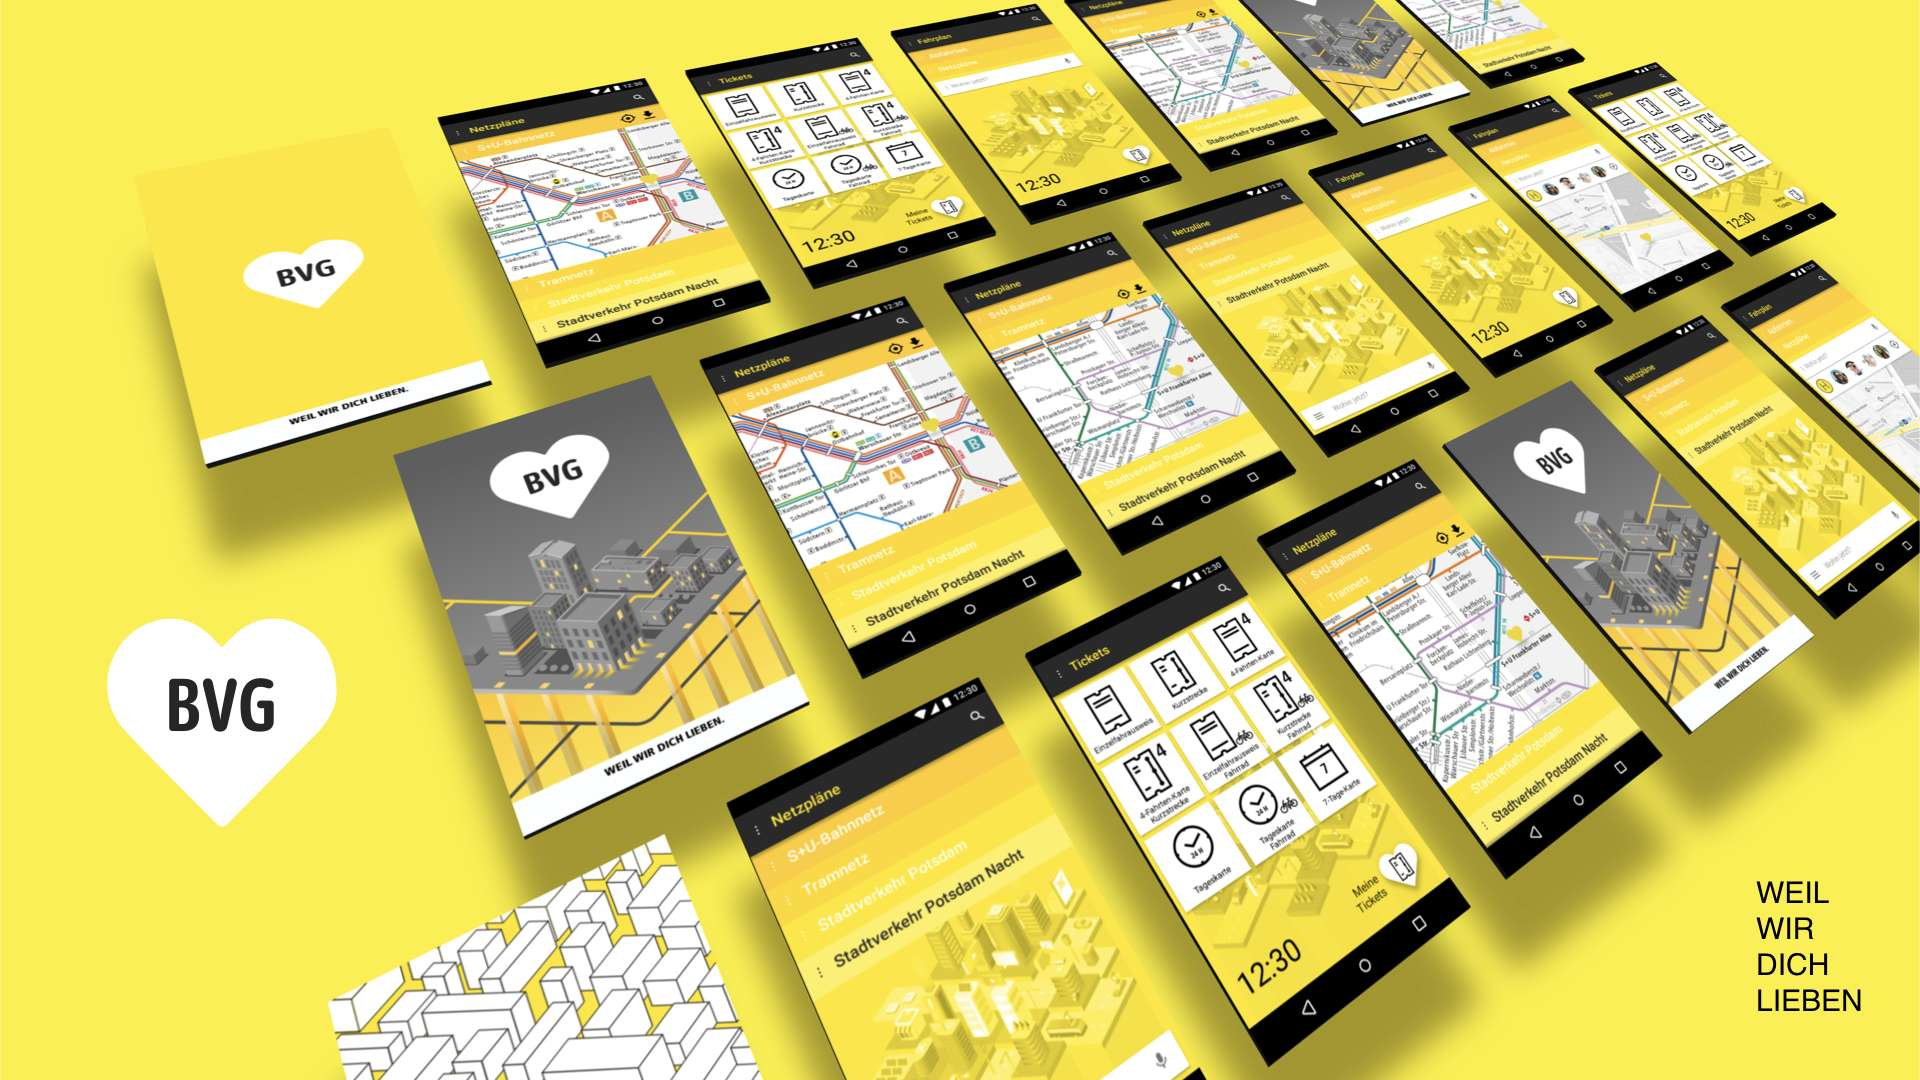 bvg-app-1